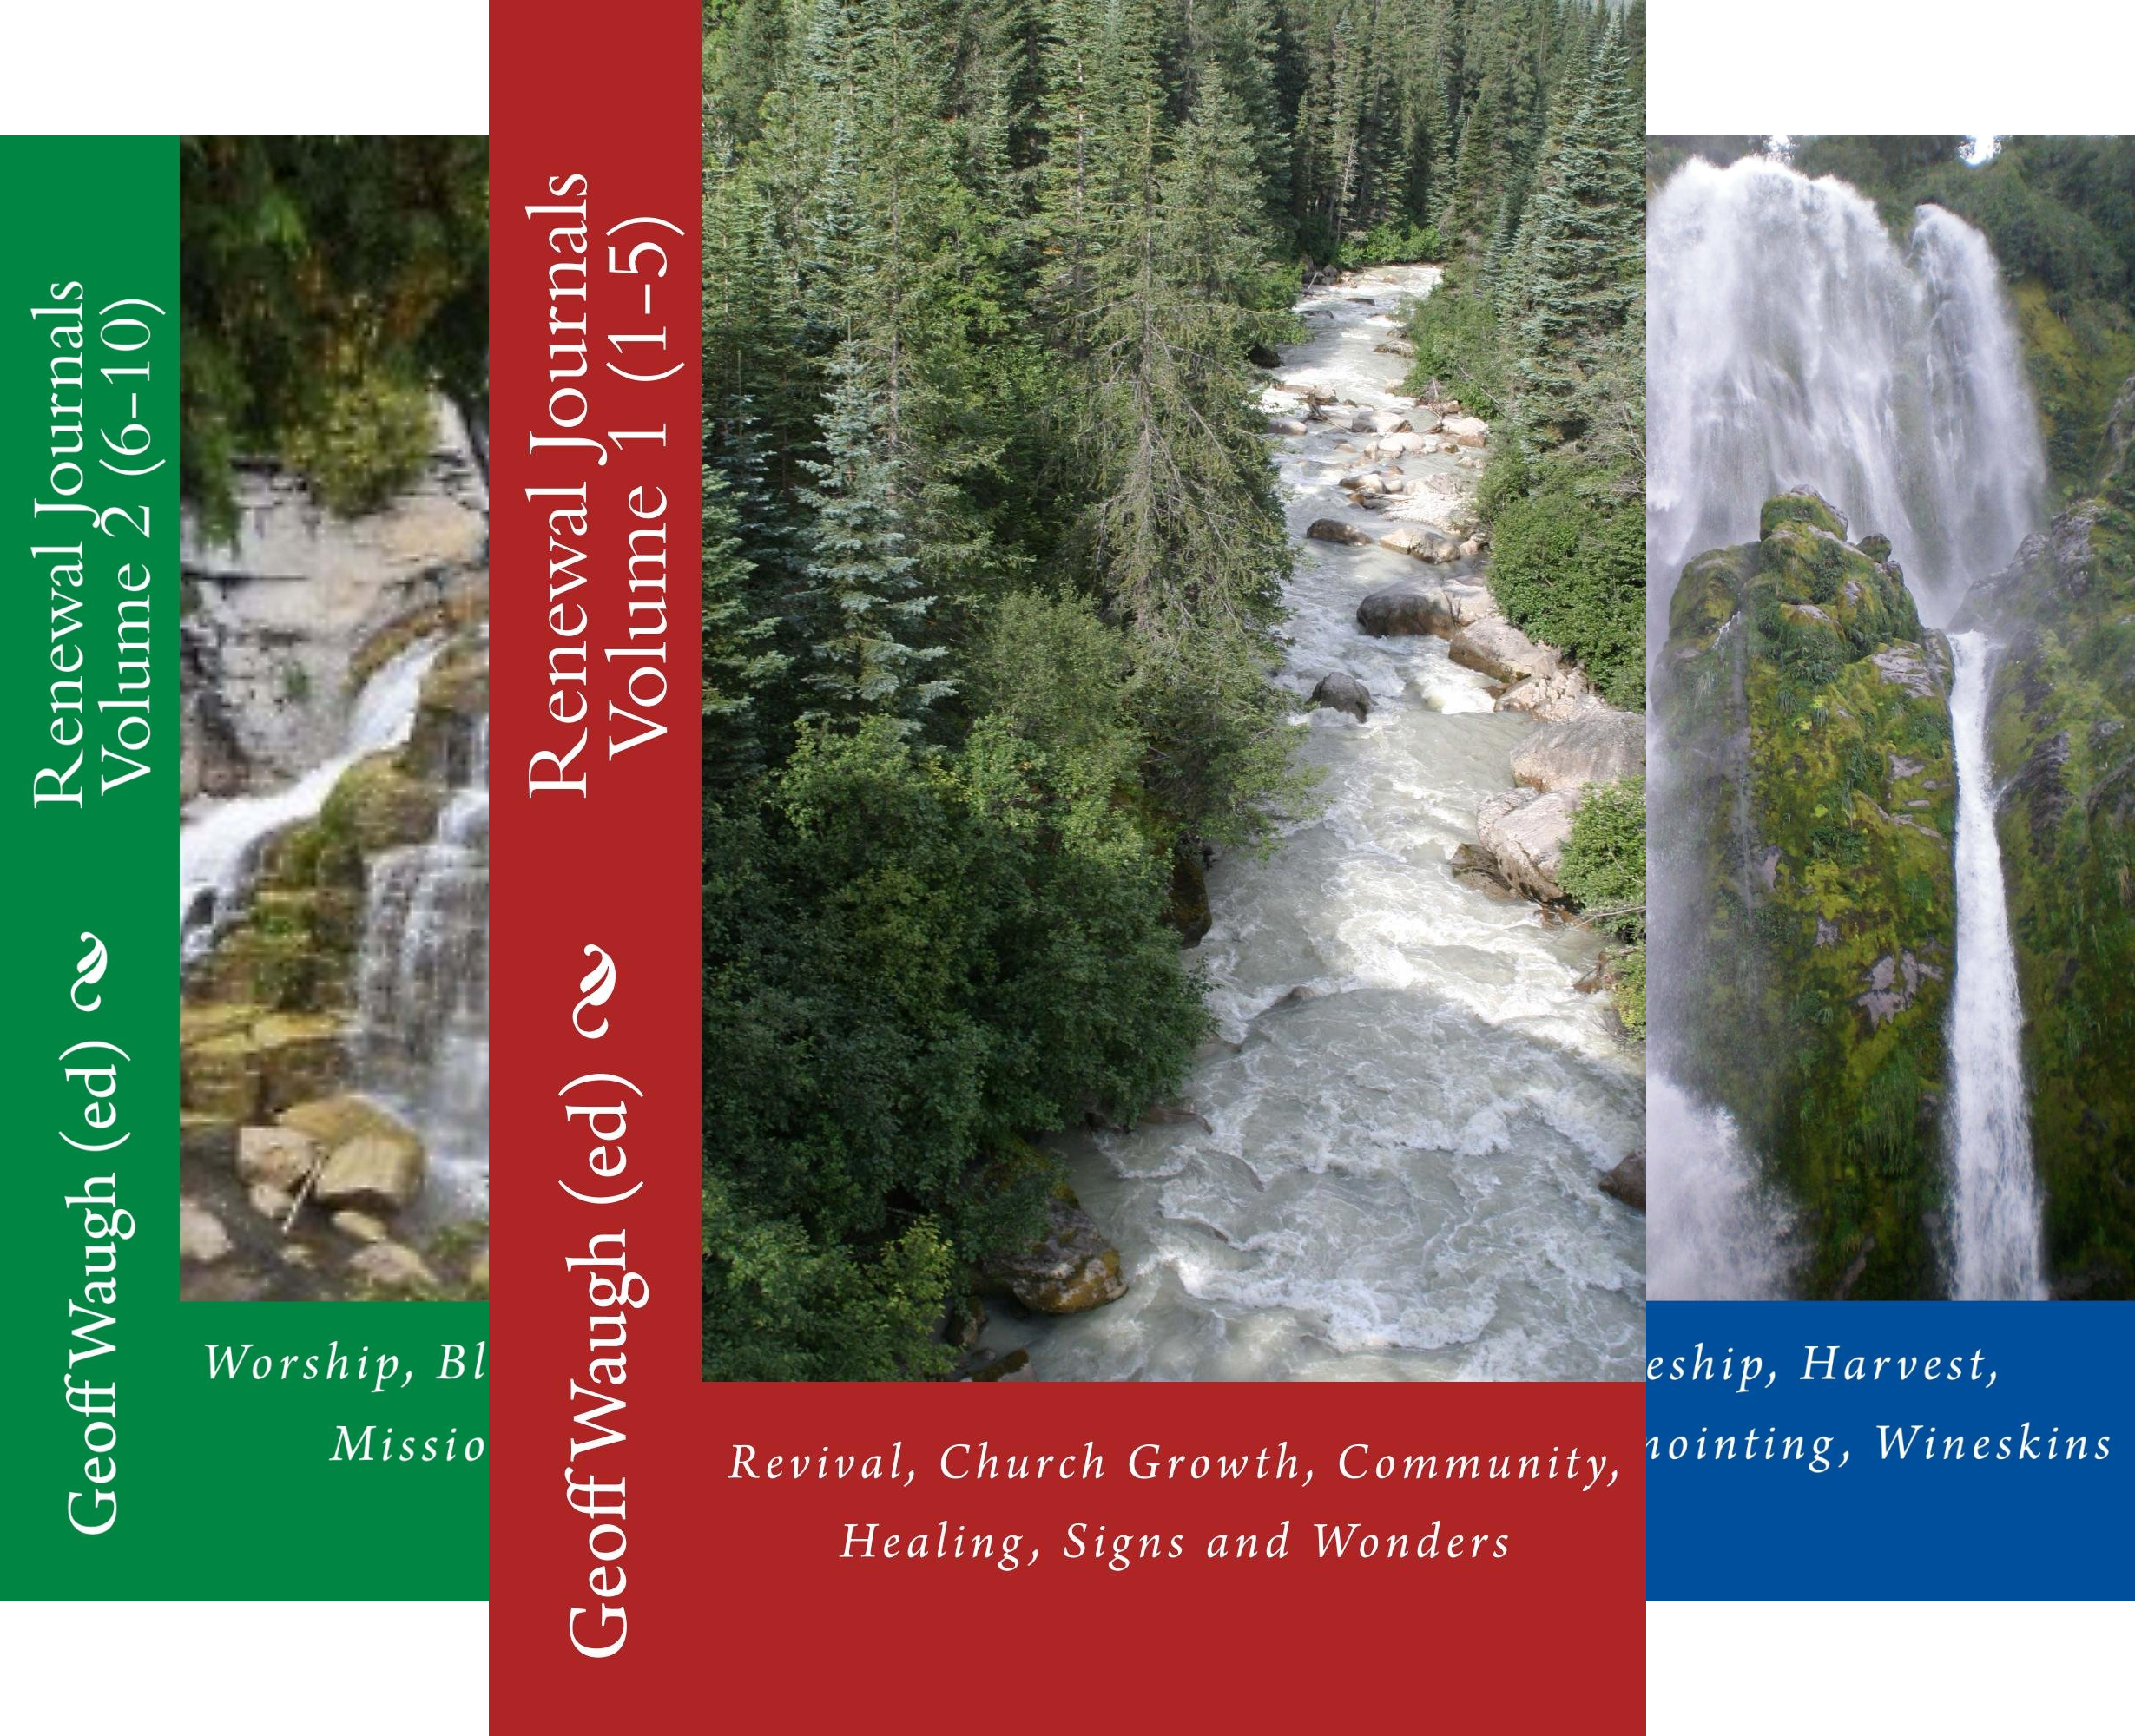 renewal-journals-4-book-series